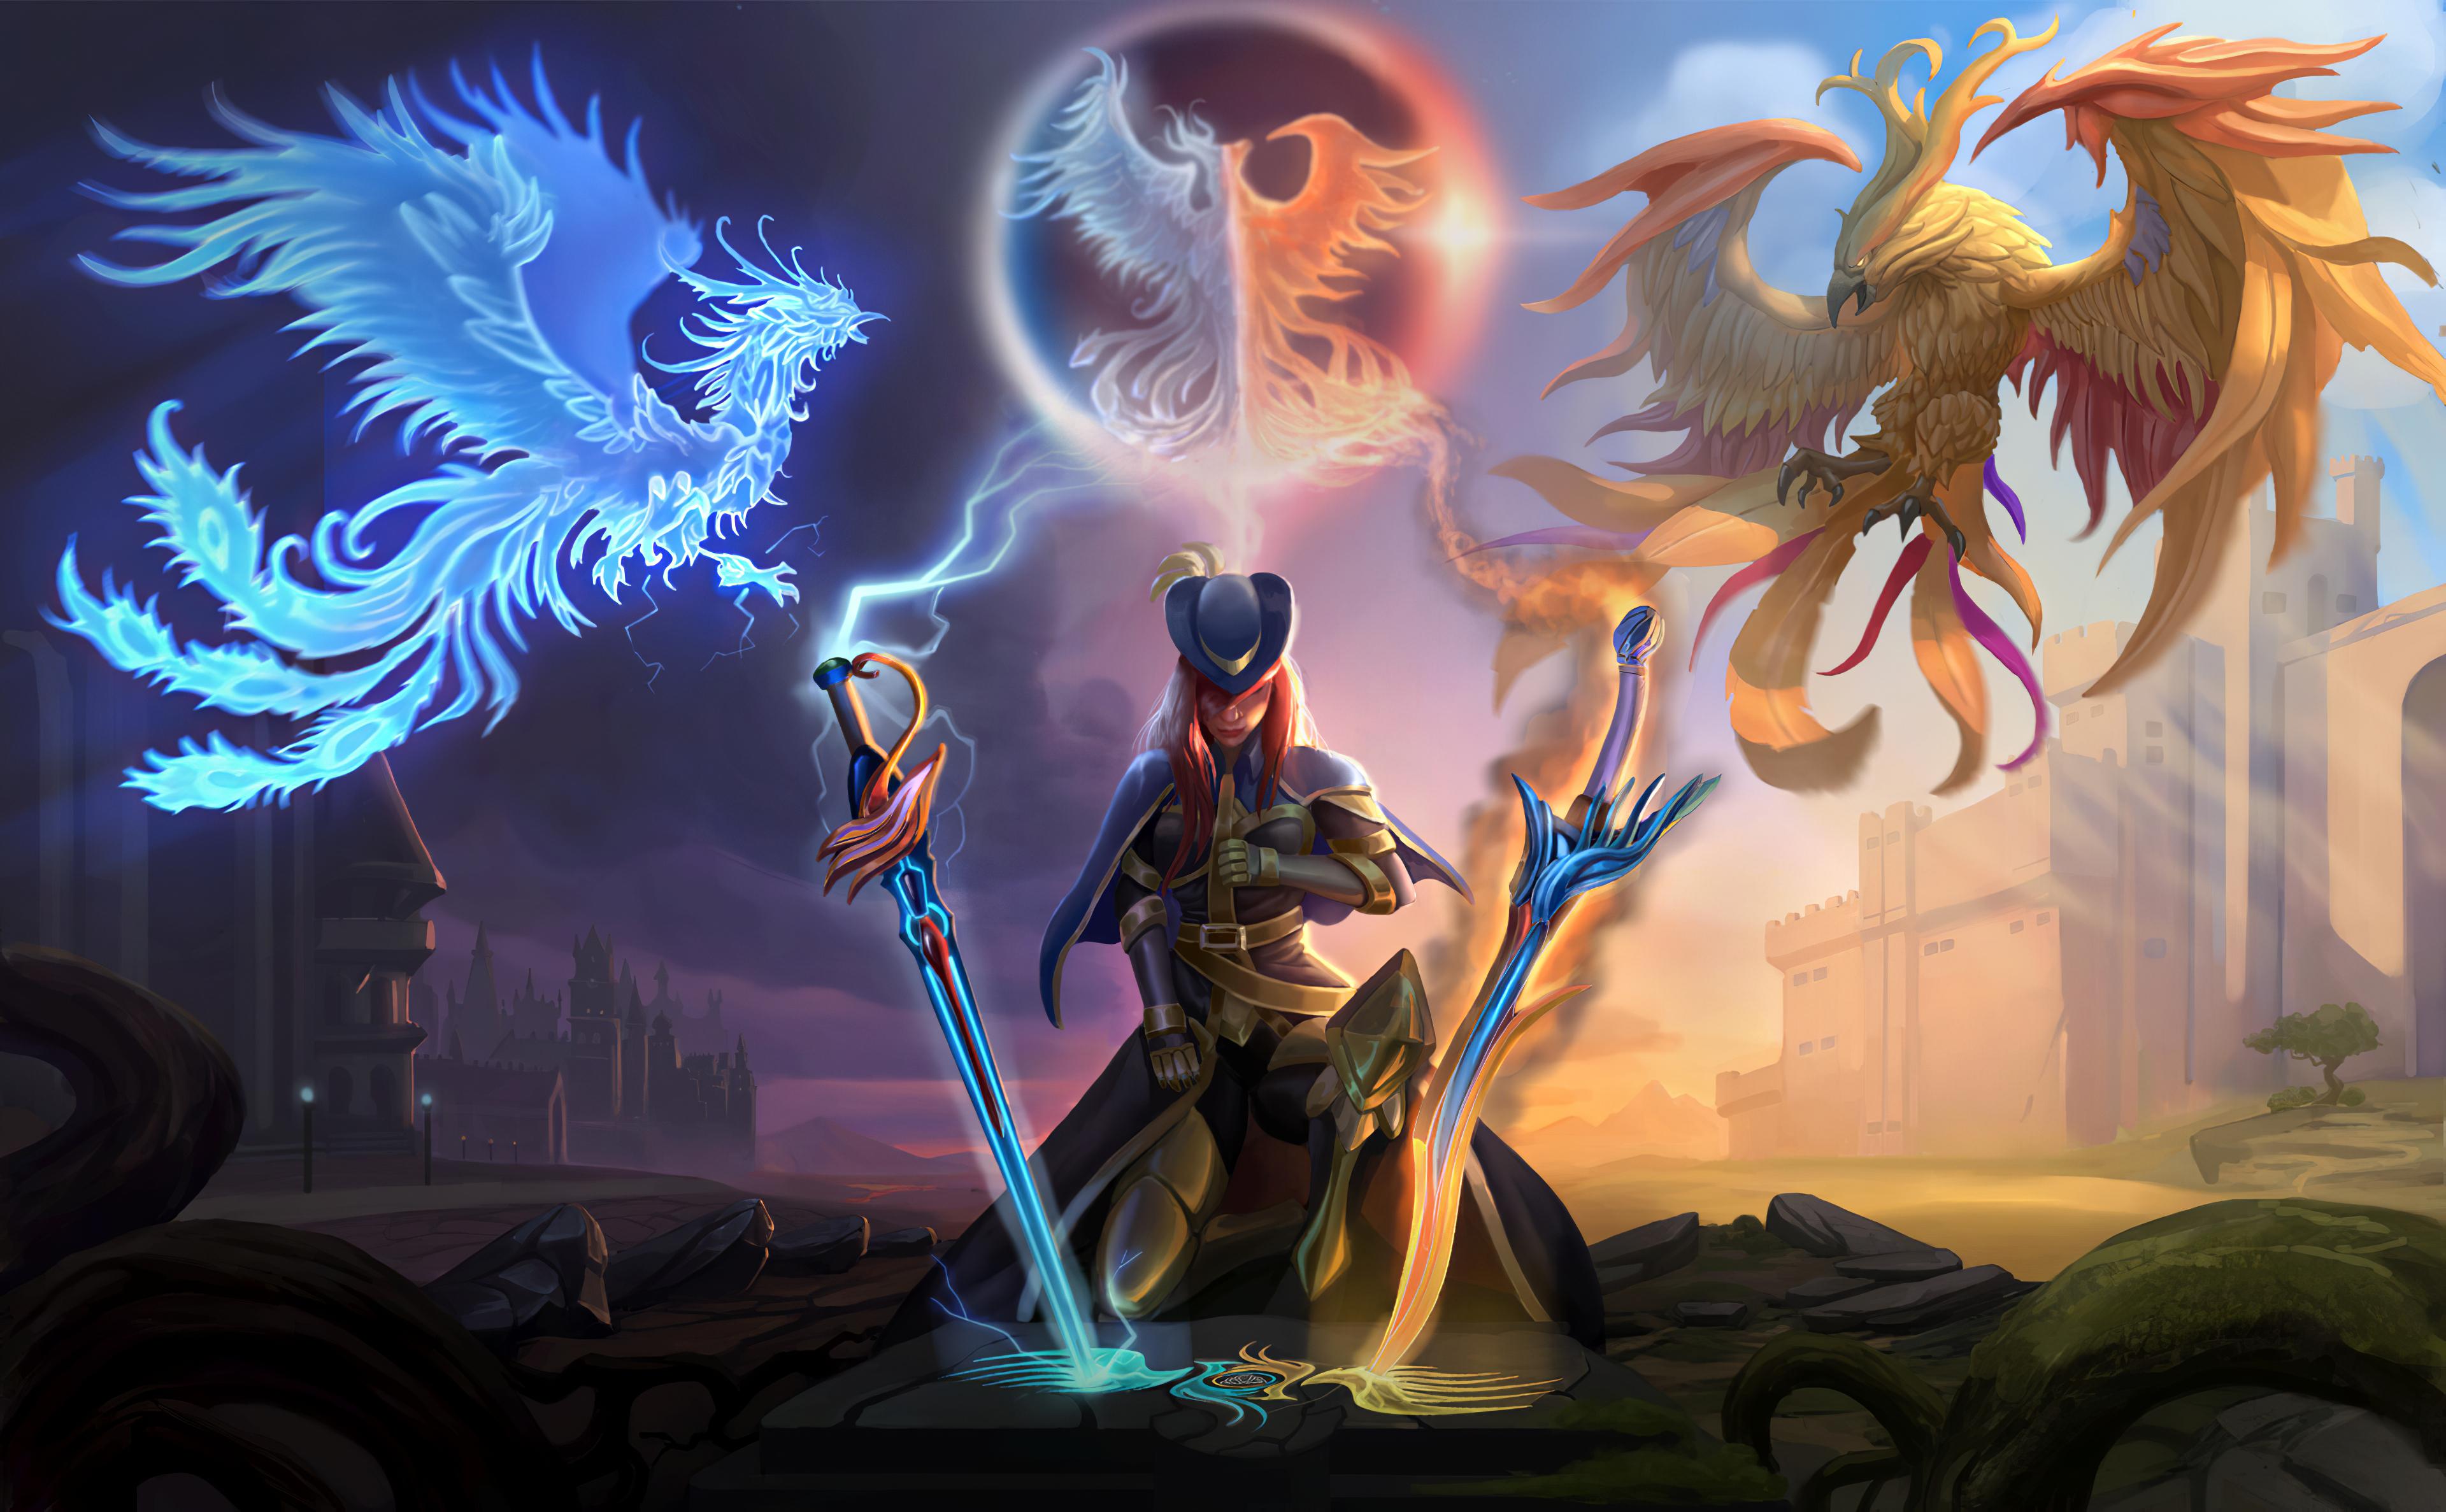 monster legends solaris 1581274906 - Monster Legends Solaris - Monster Legends Solaris wallpapers, Monster Legends Solaris game 4k wallpapers